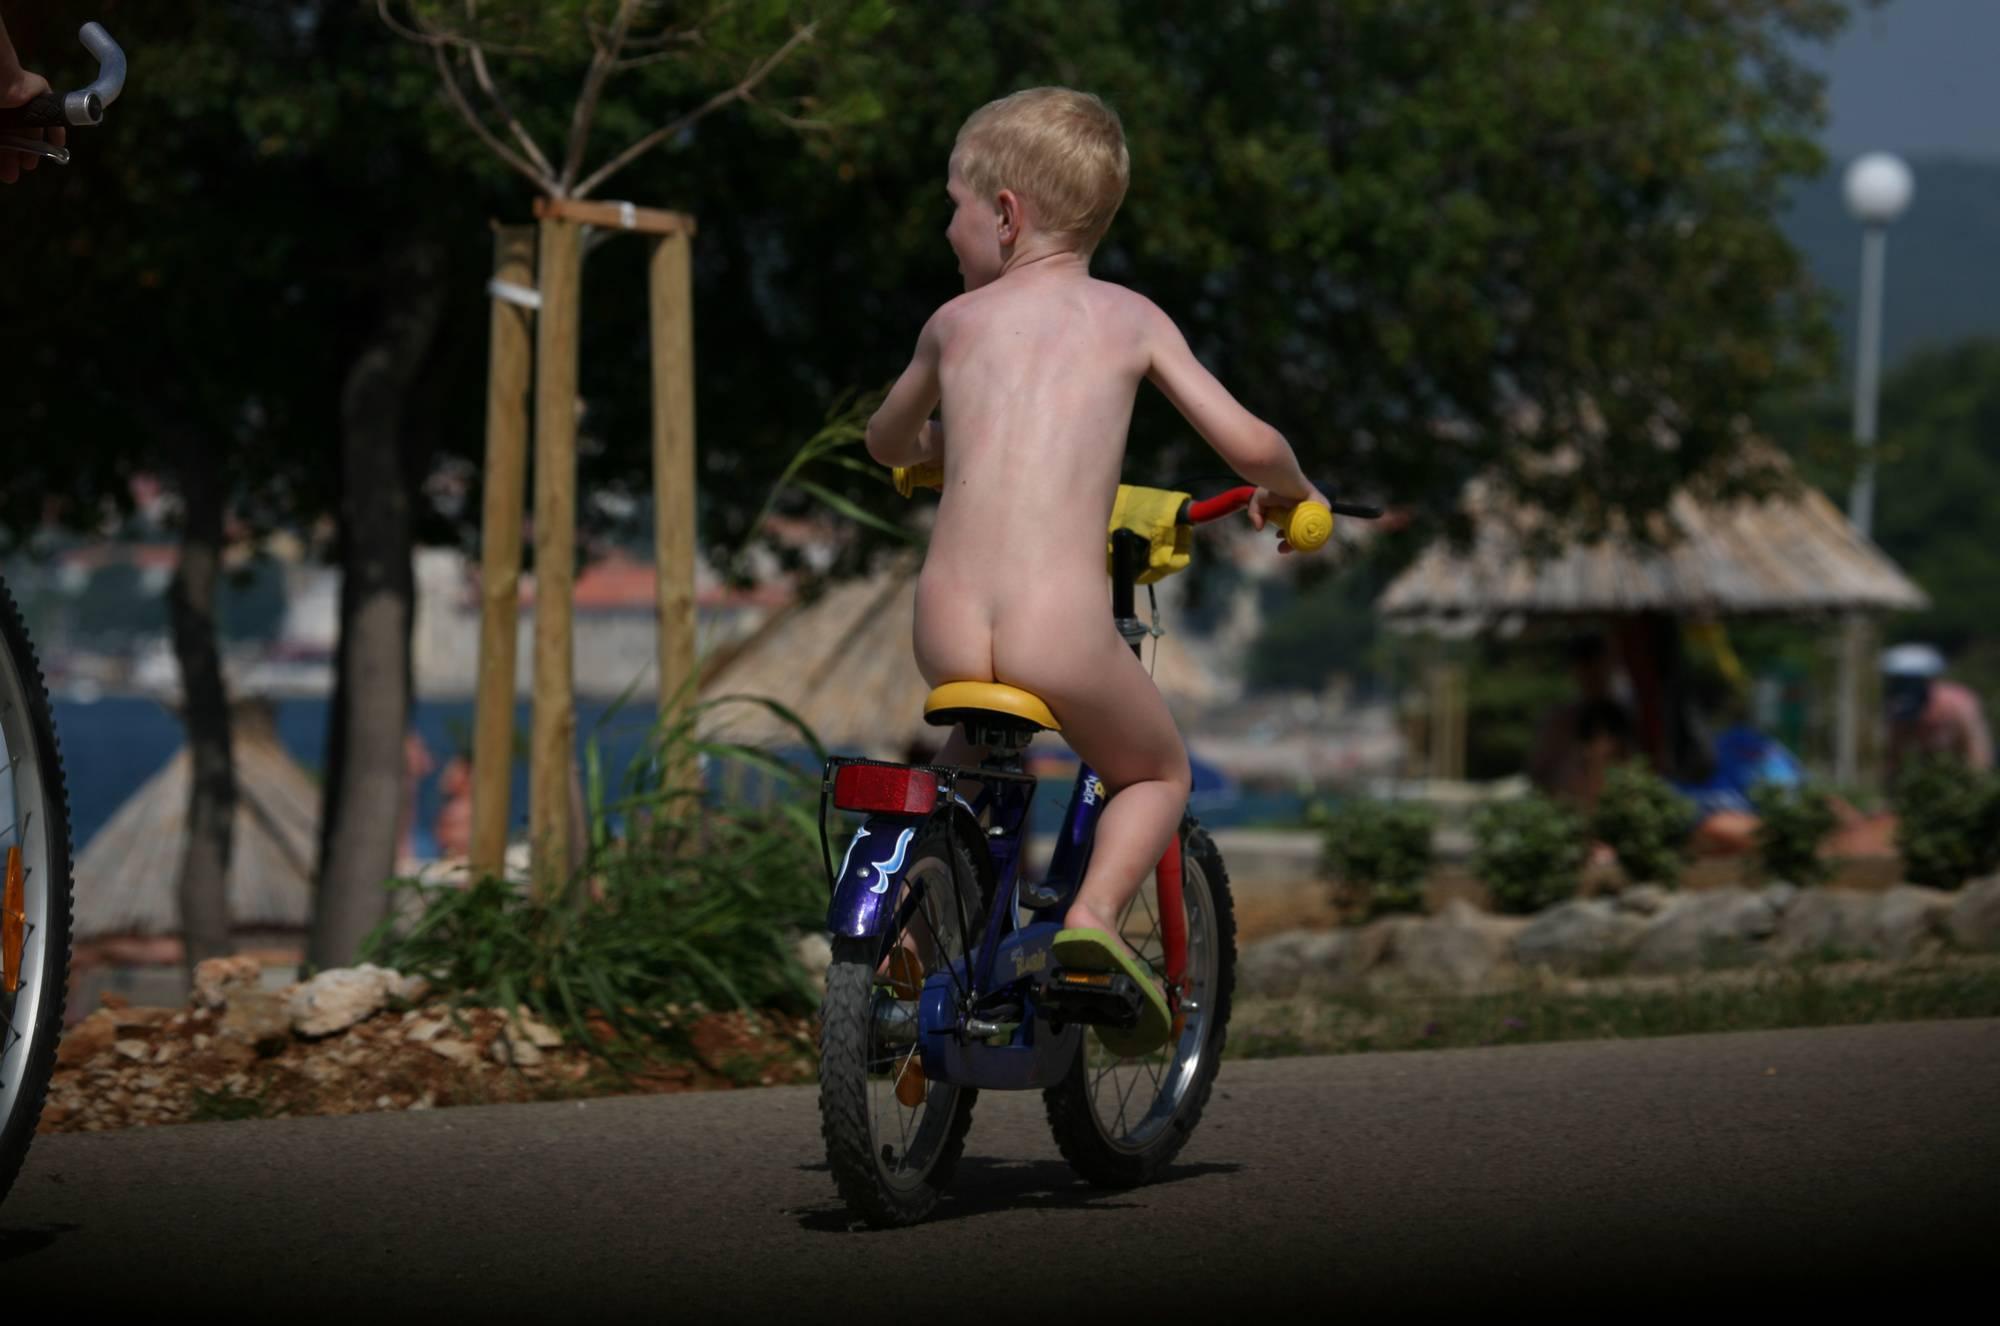 Nudist Pics Pier FKK Biking Activity - 1